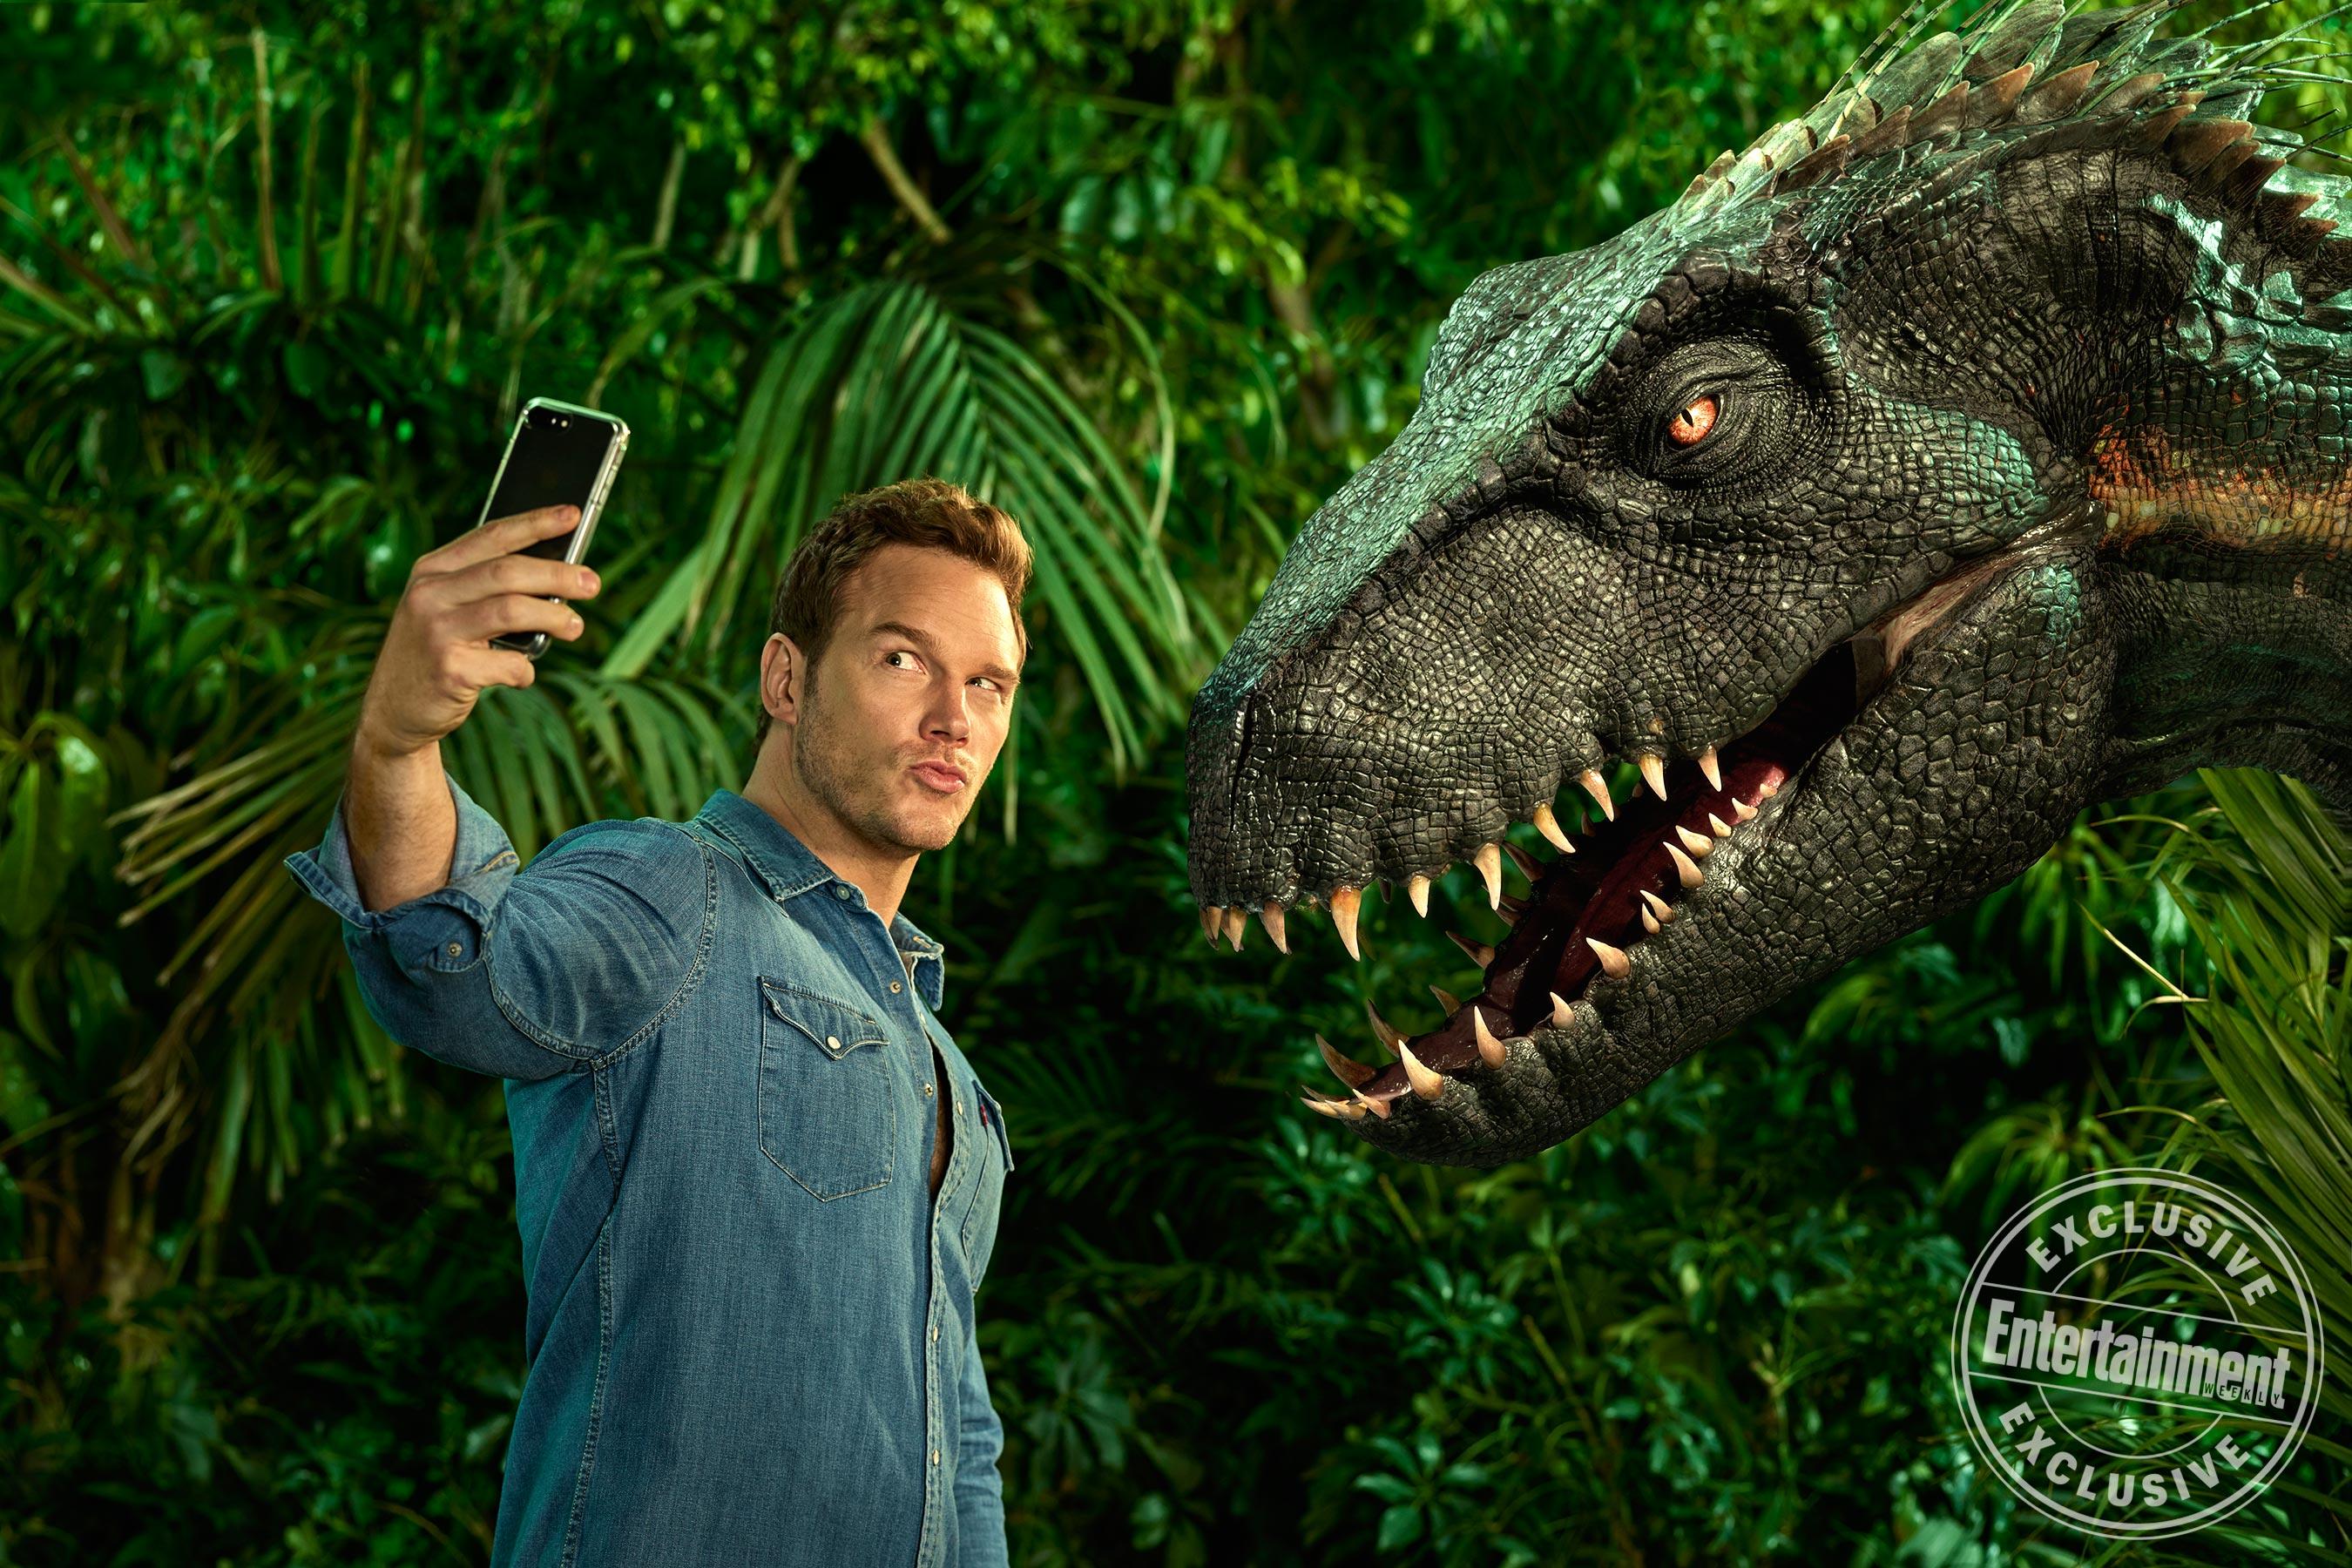 Chris Pratt Bilder Chris Pratt   Entertainment Weekly Photoshoot 2700x1800